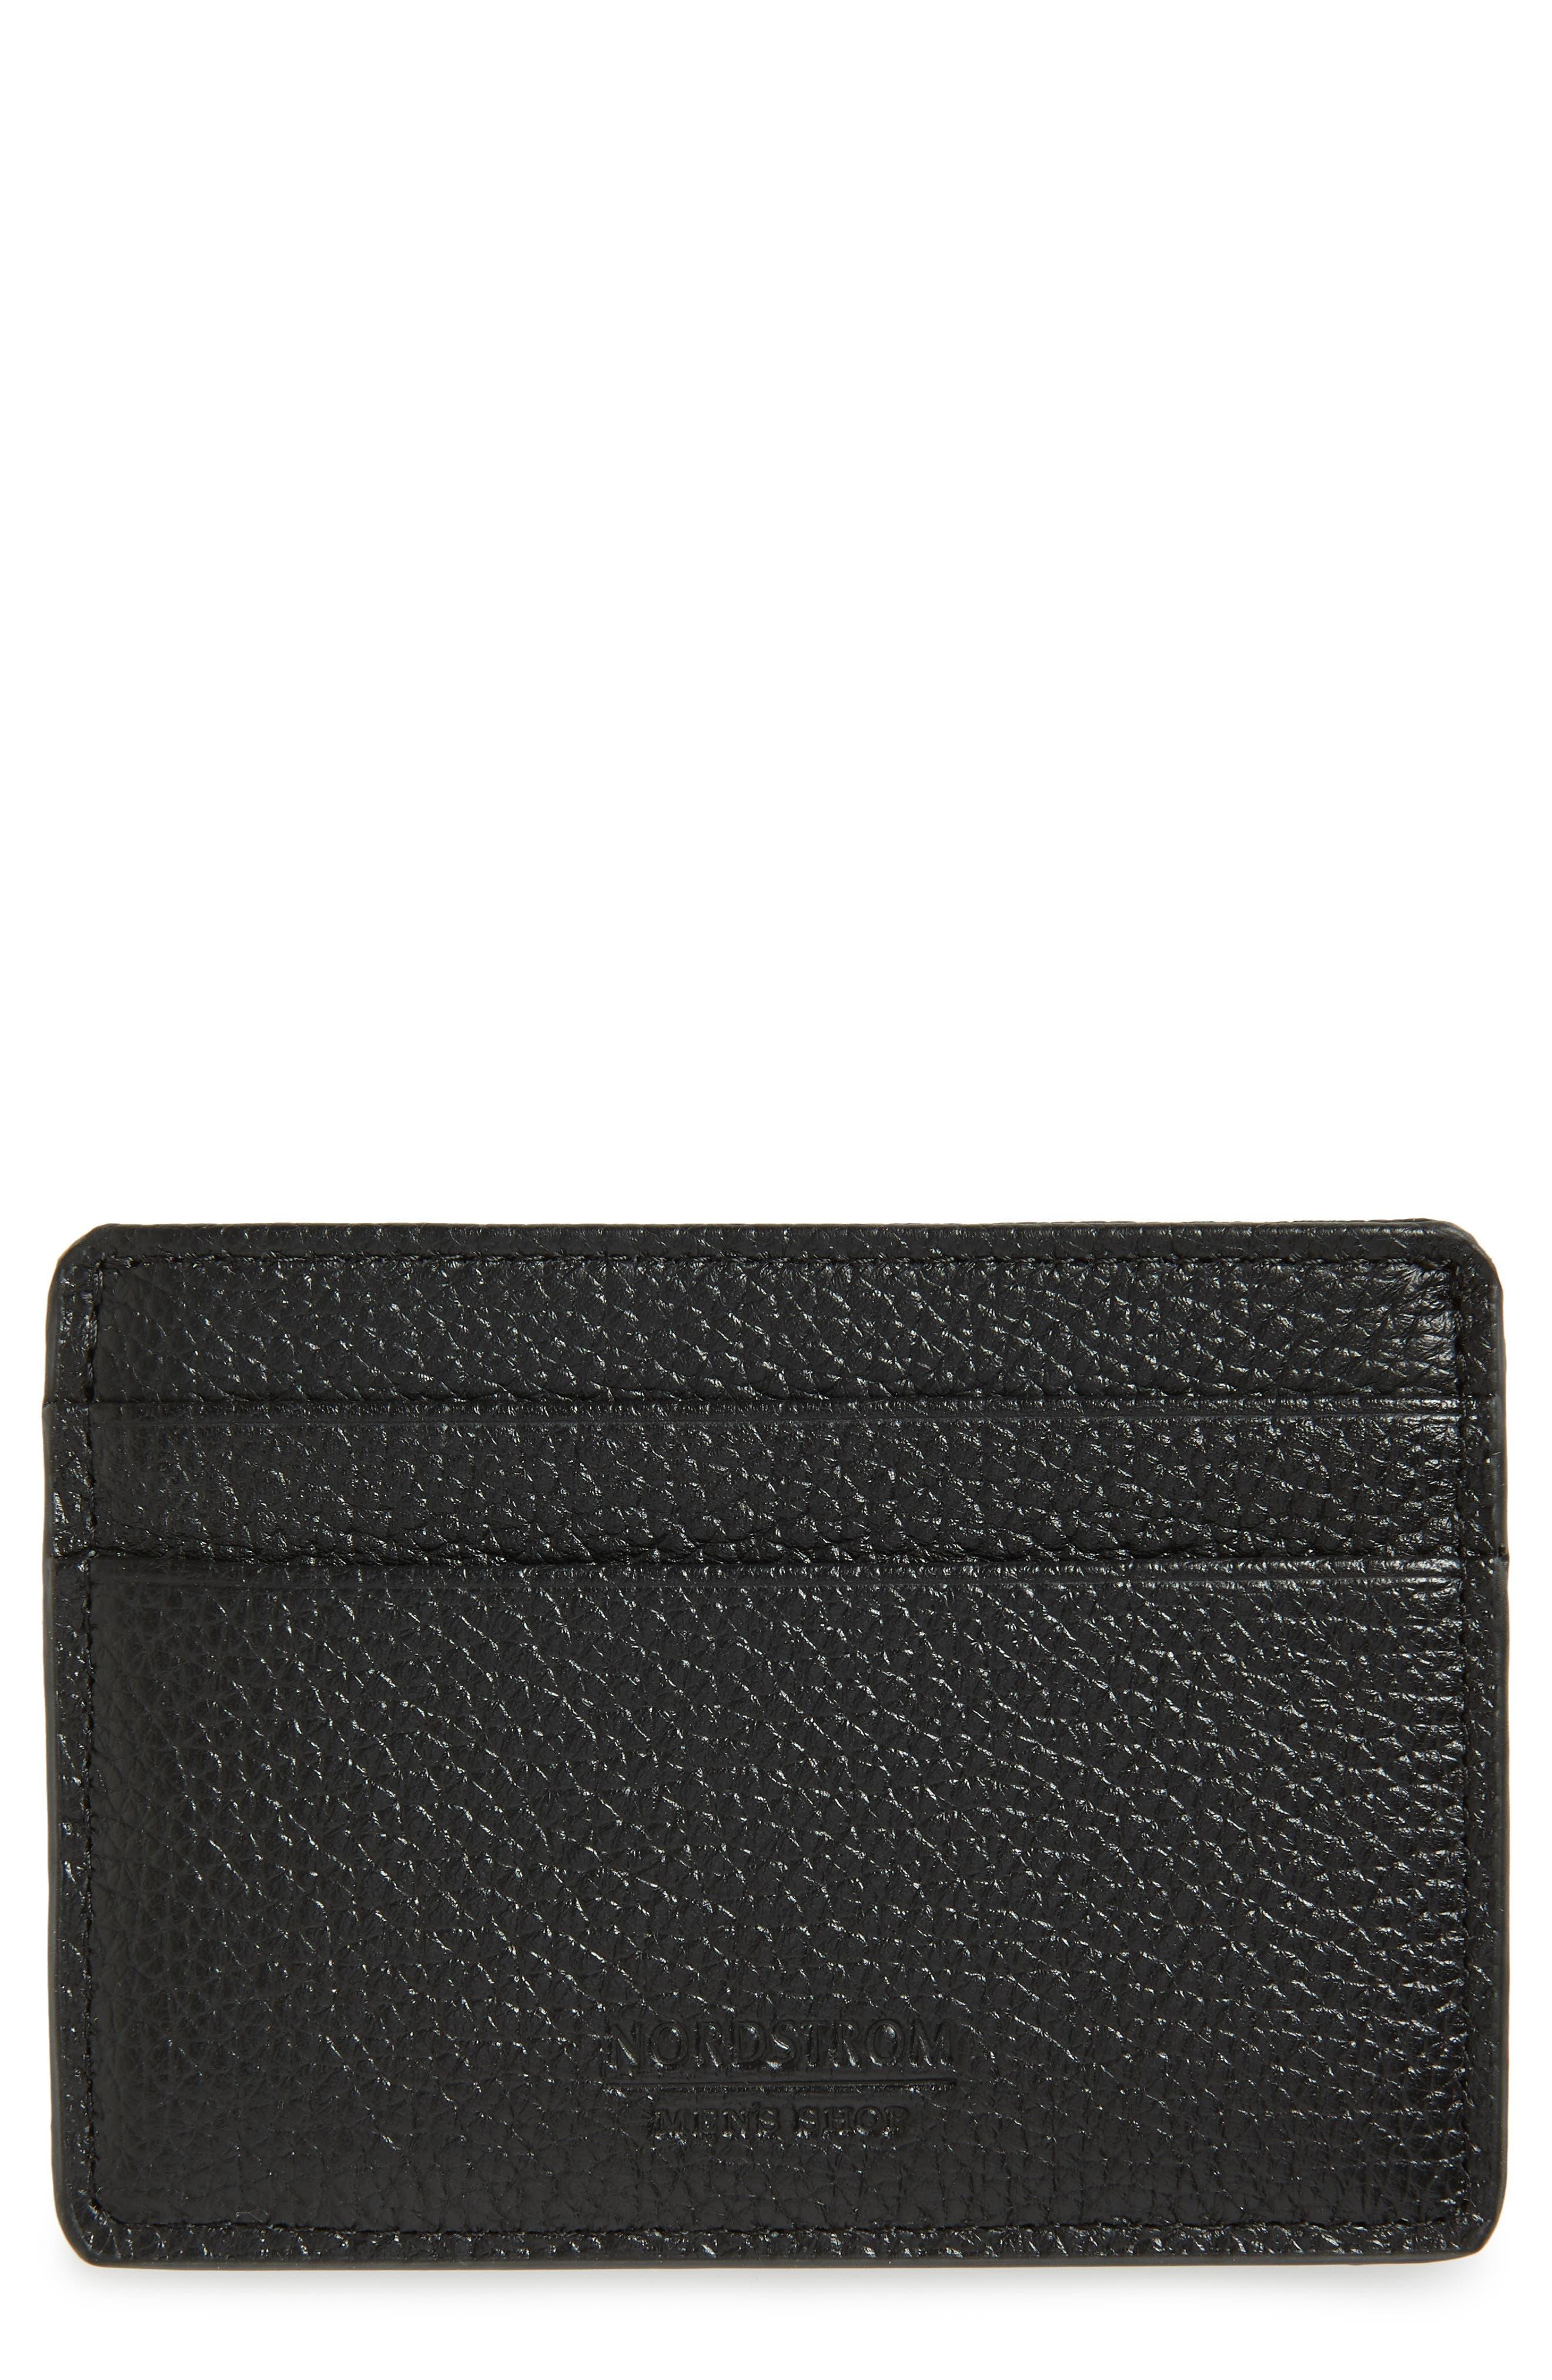 Midland RFID Leather Card Case,                             Main thumbnail 1, color,                             BLACK